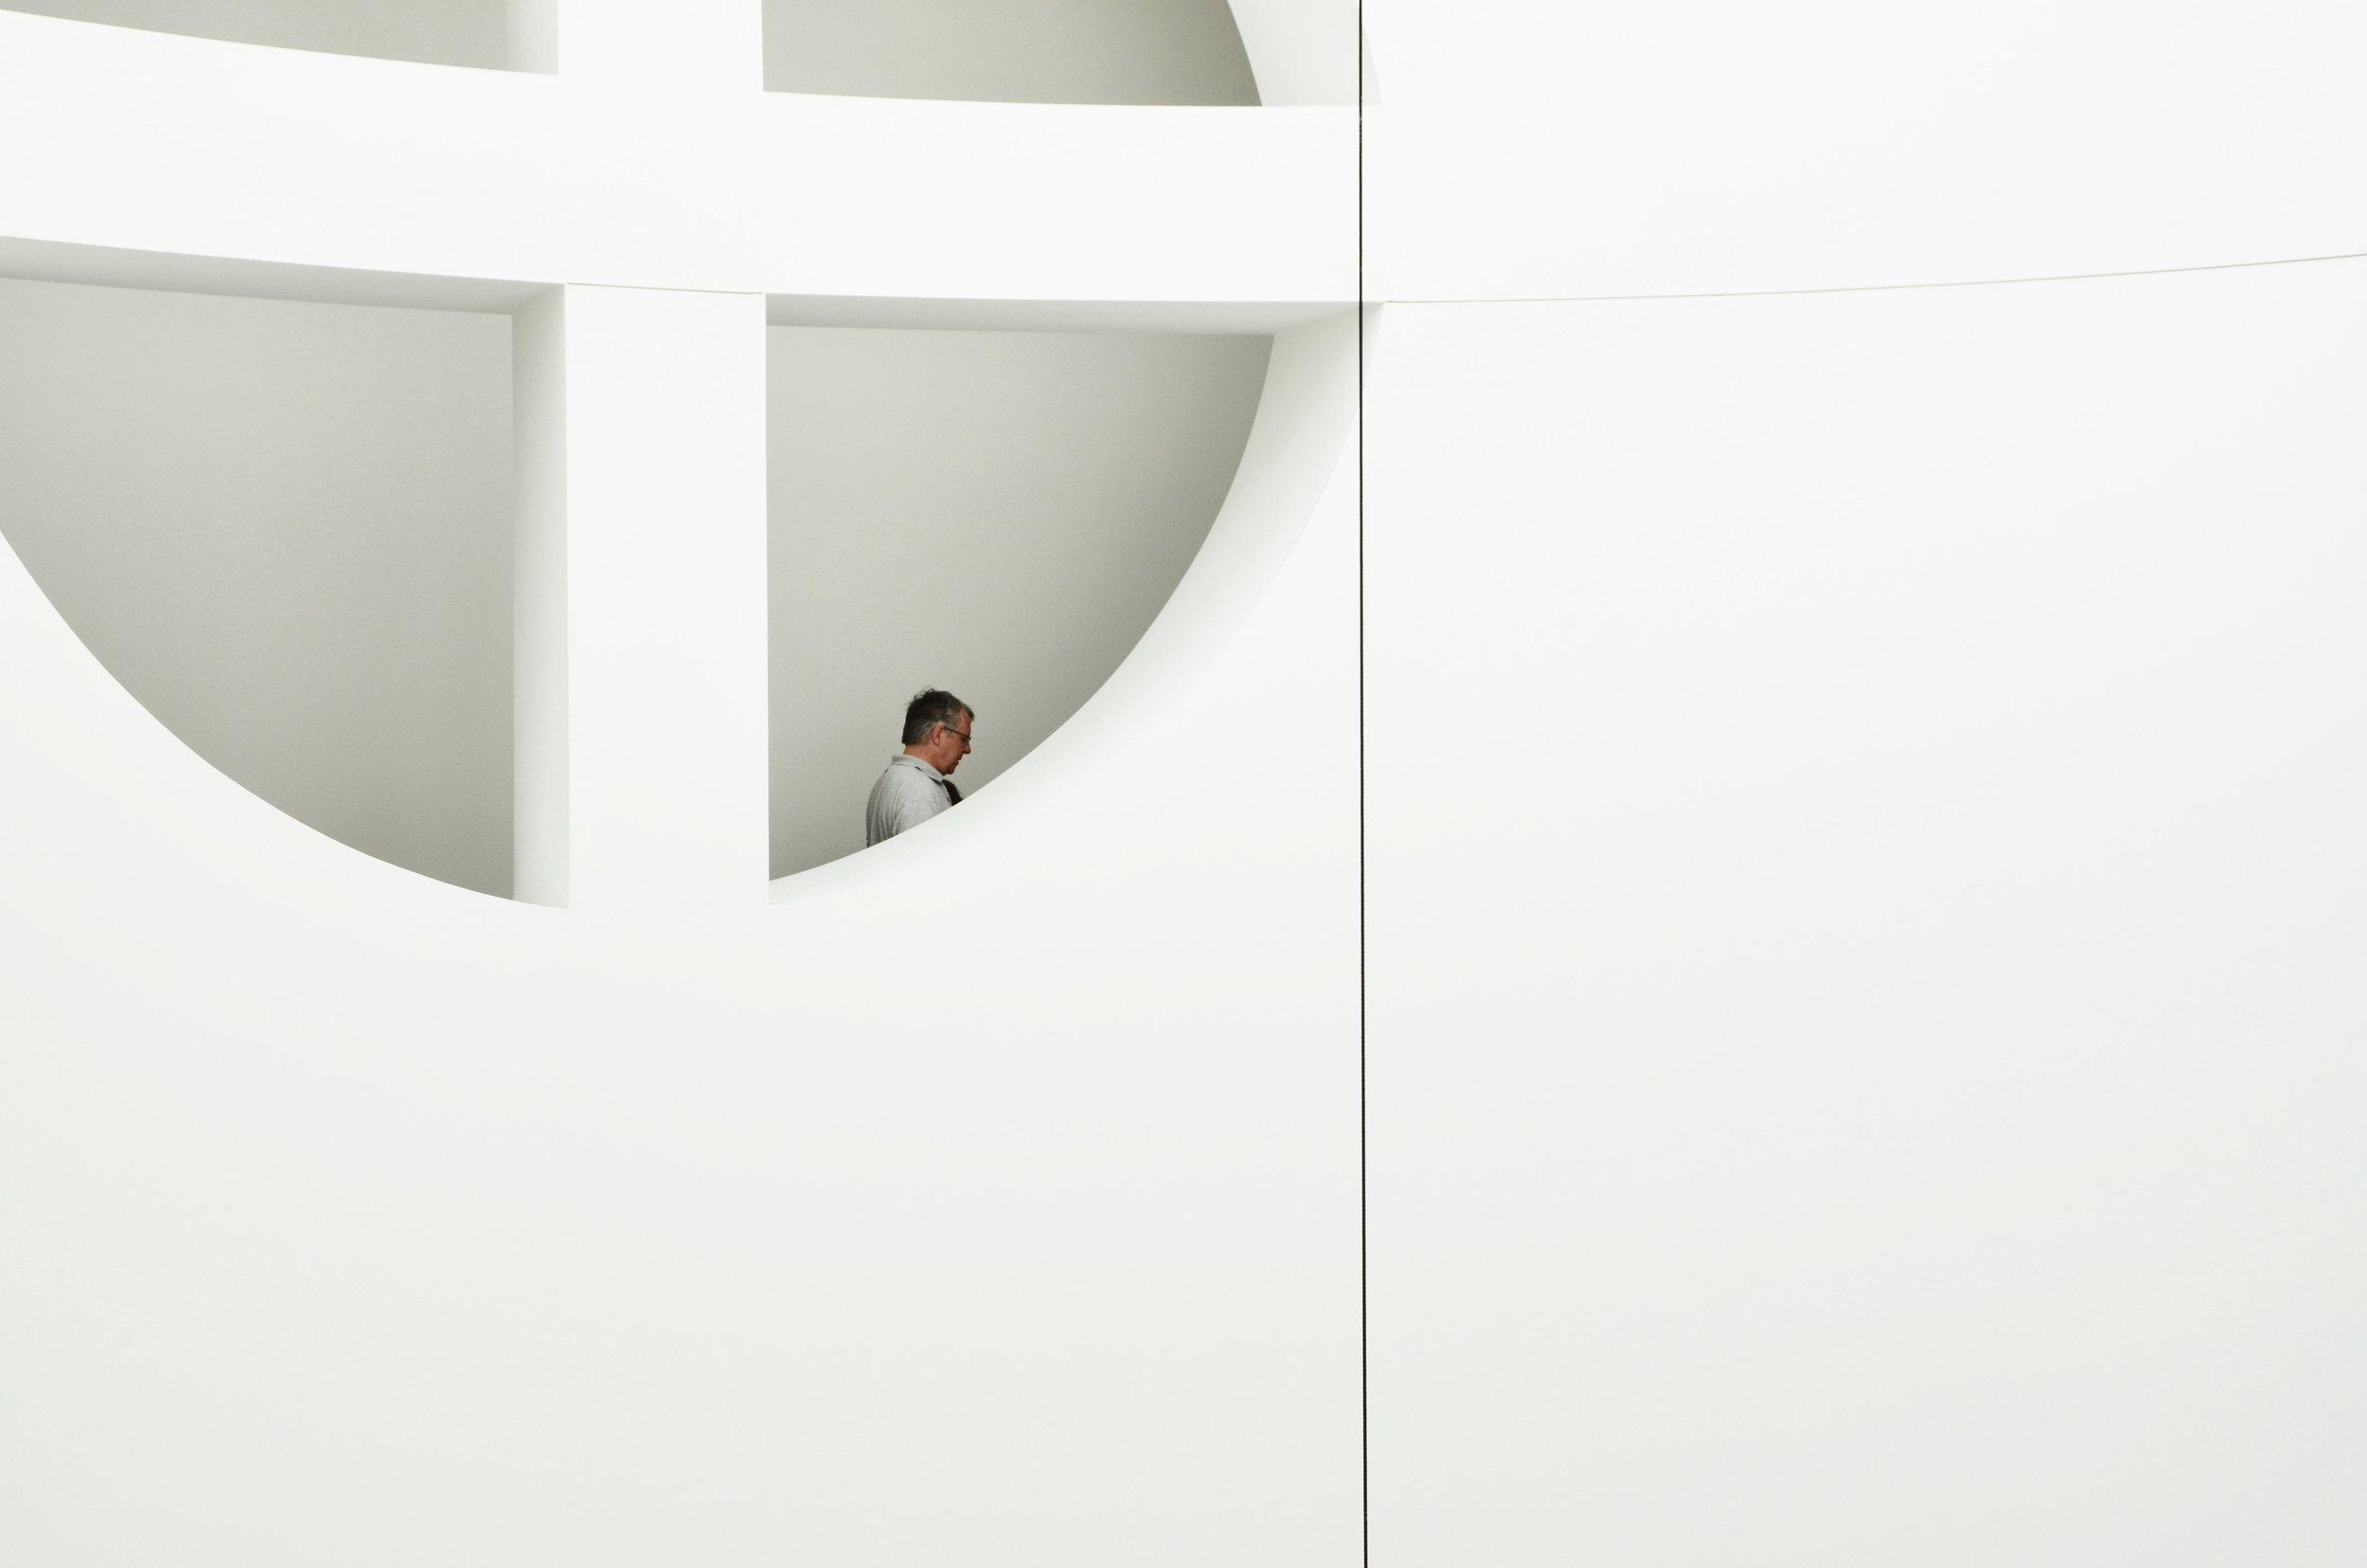 free-and-native-man-window.jpg